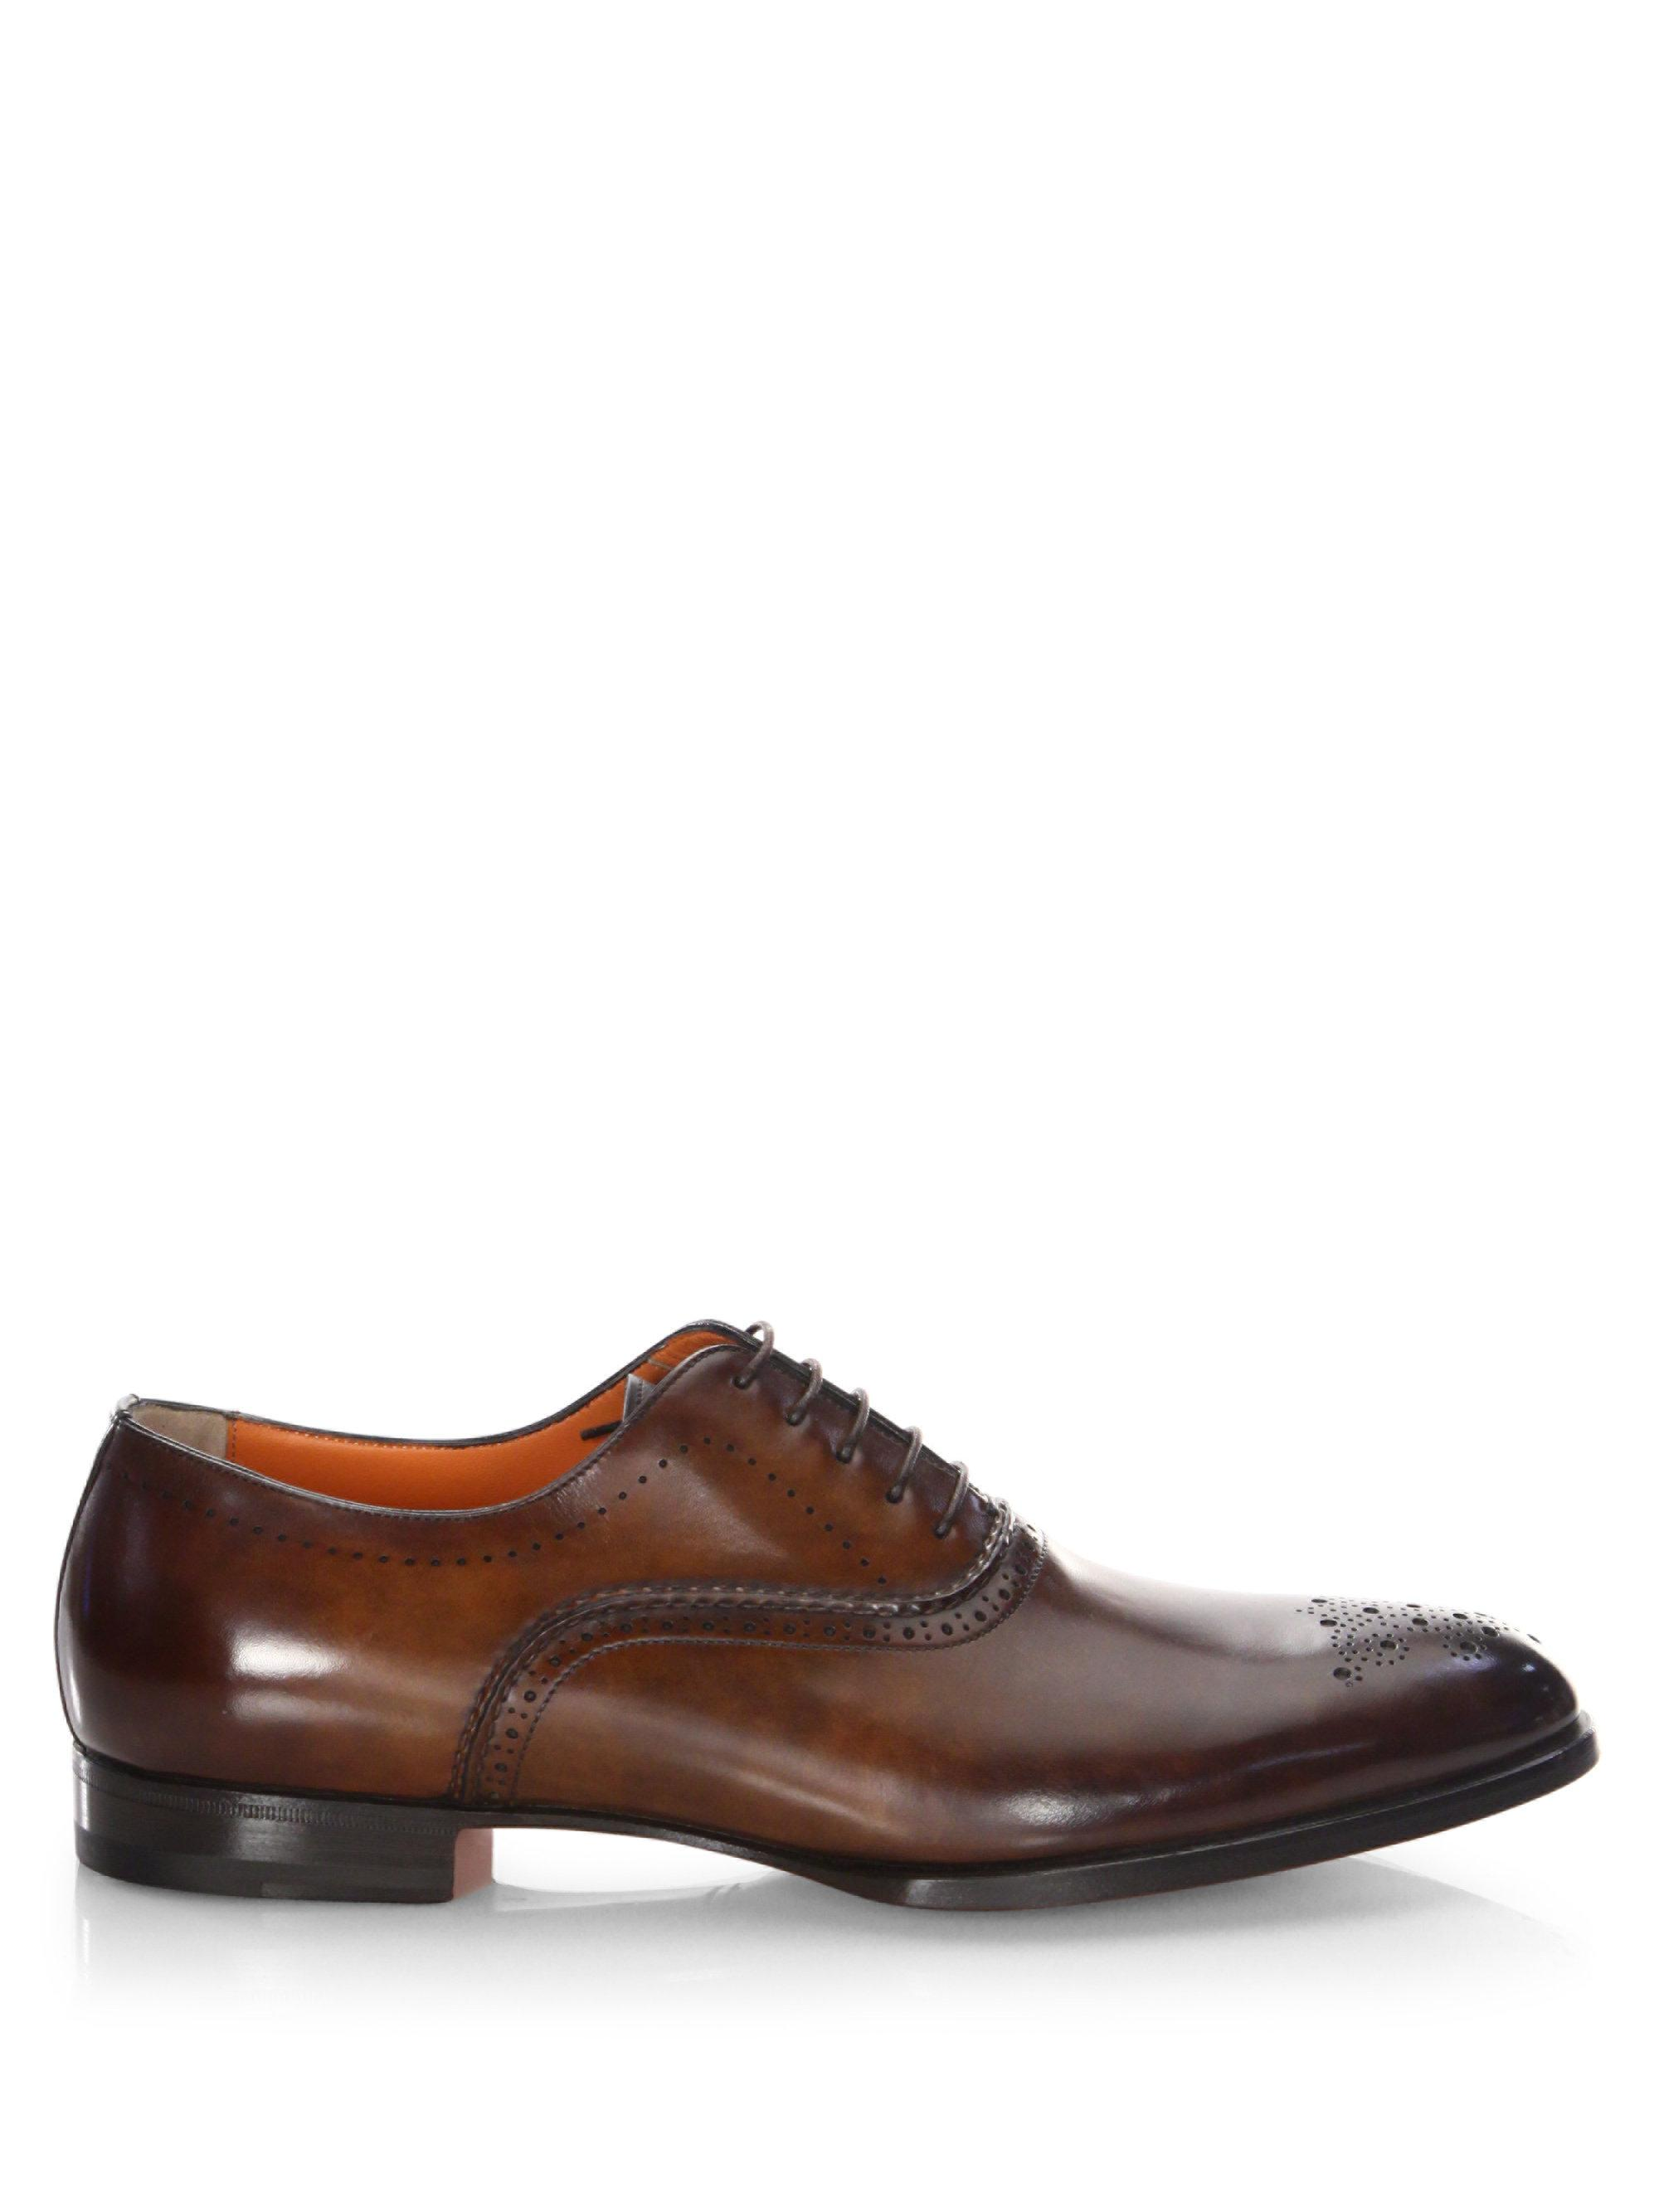 santoni Hand-Stitched Leather Oxfords wuyRP